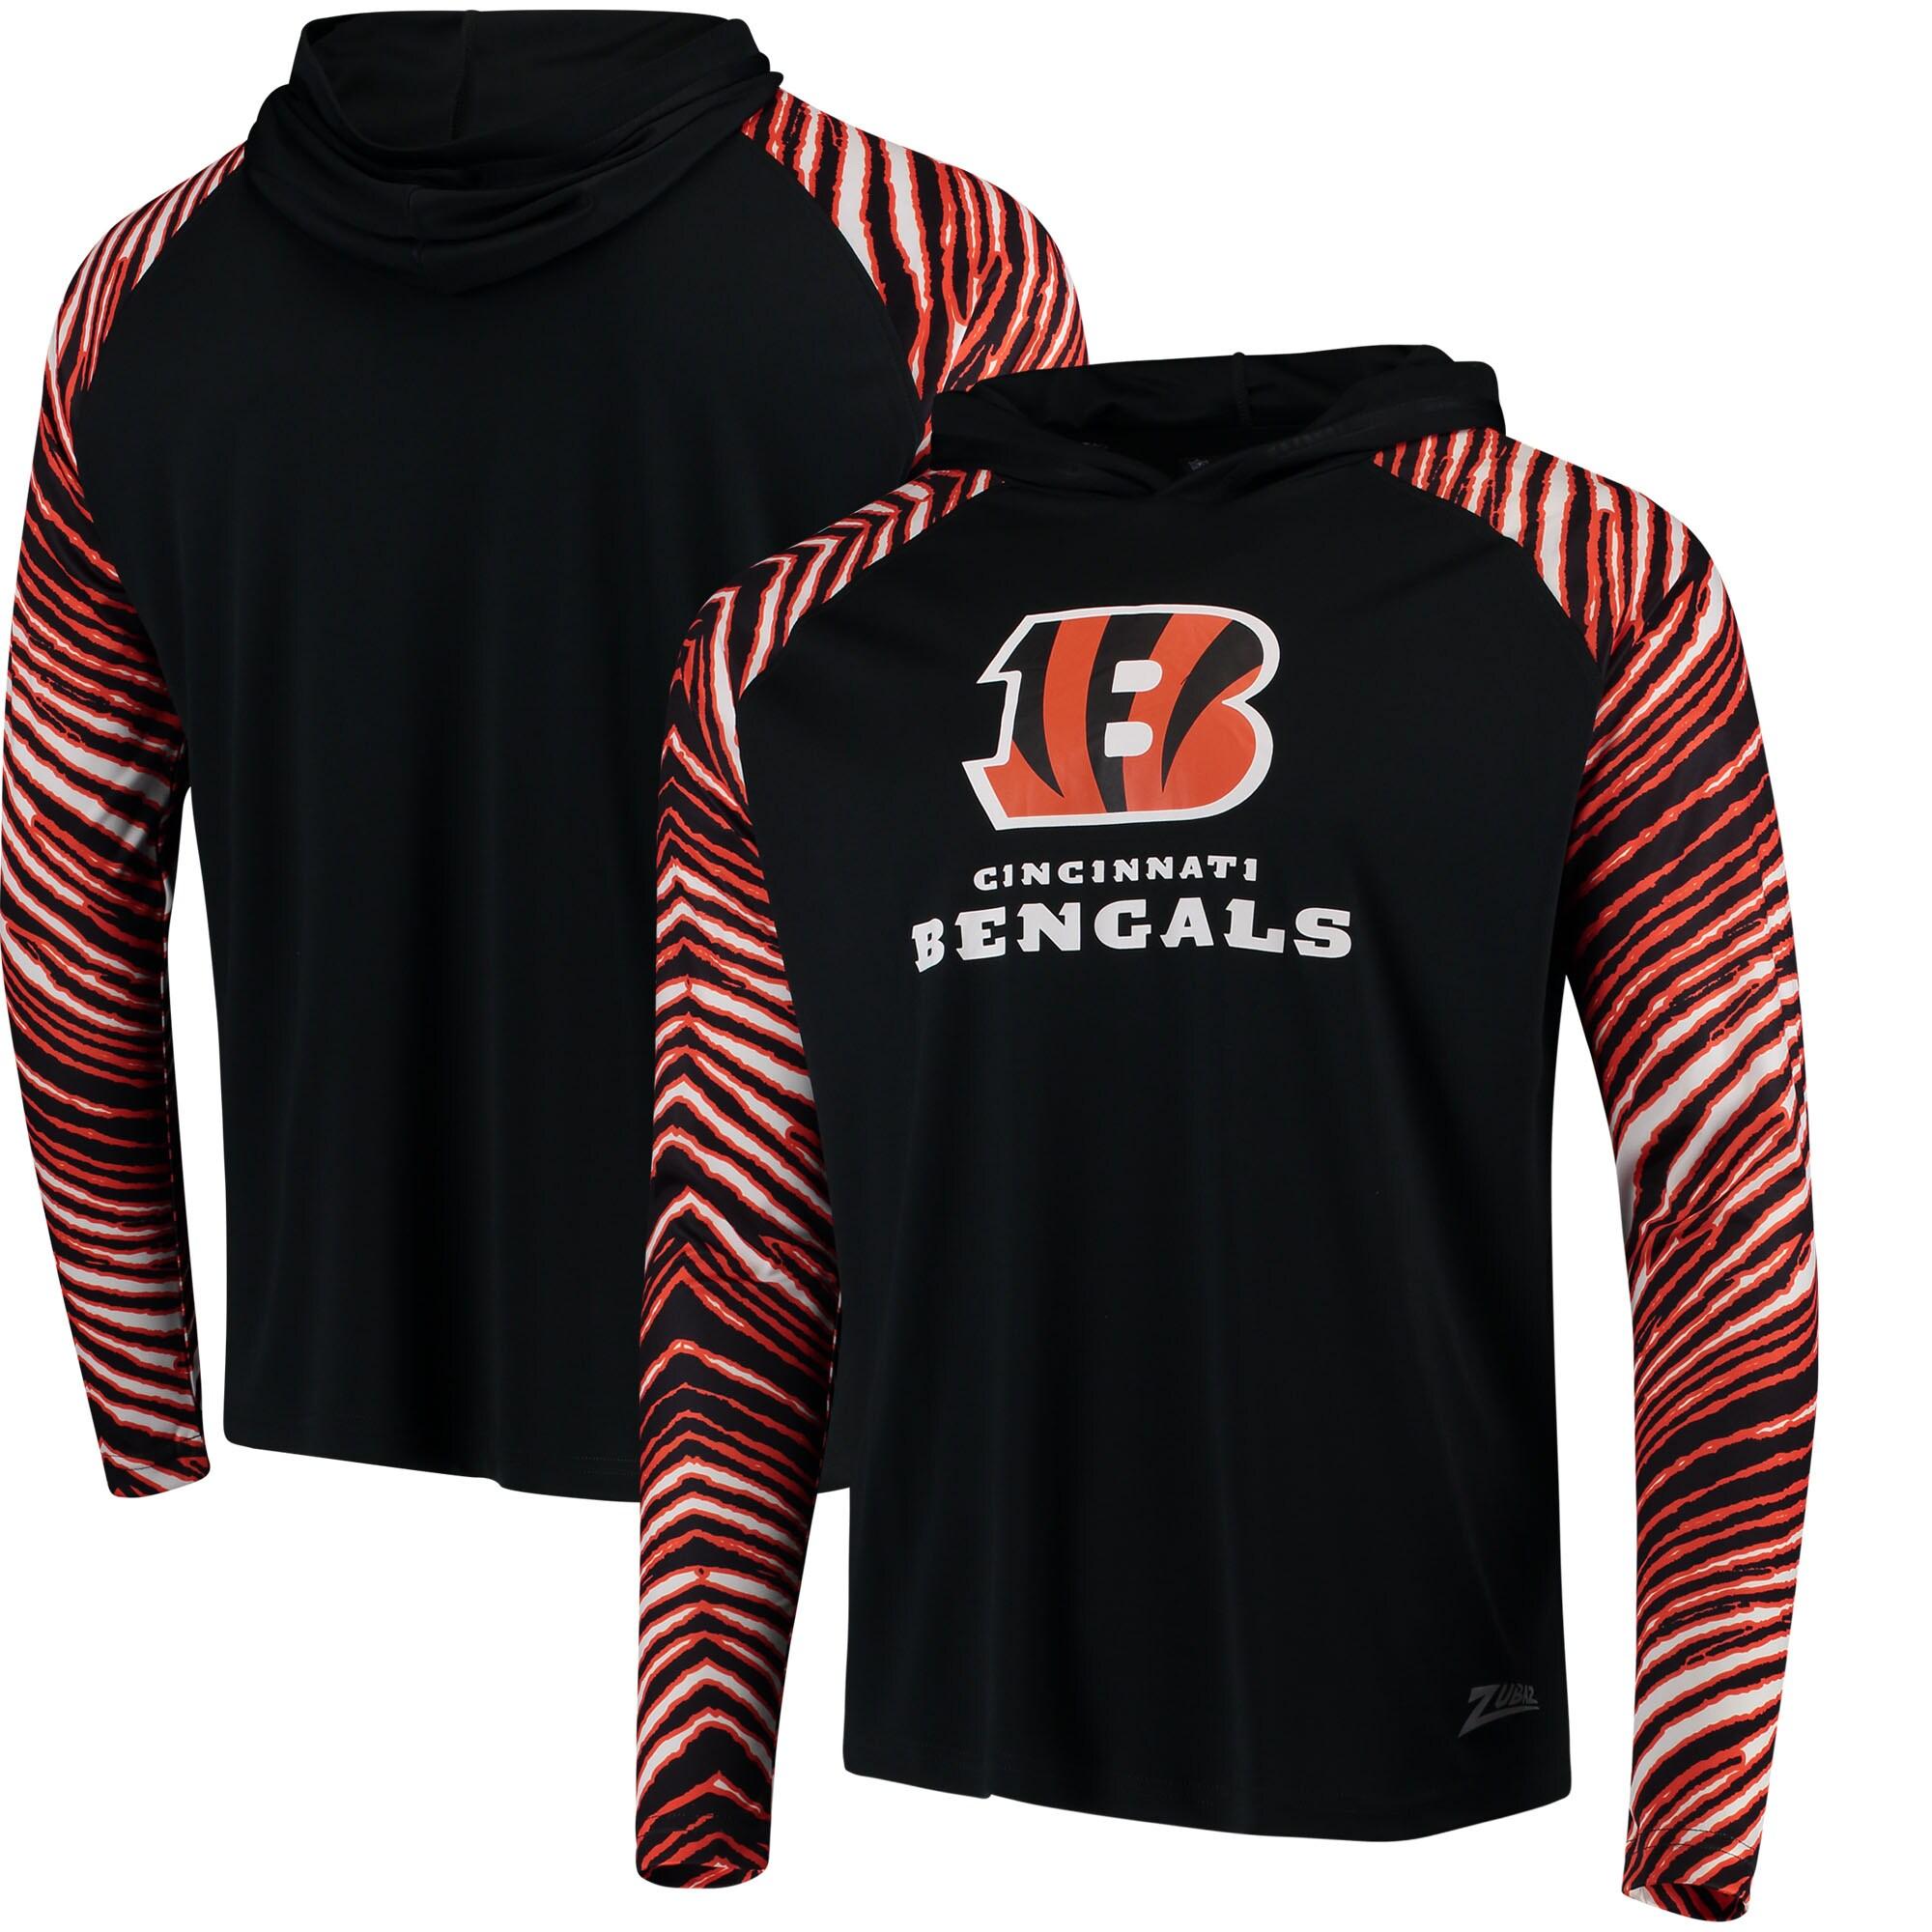 Cincinnati Bengals Zubaz Team Logo Long Sleeve Hoodie T-Shirt - Black/Orange